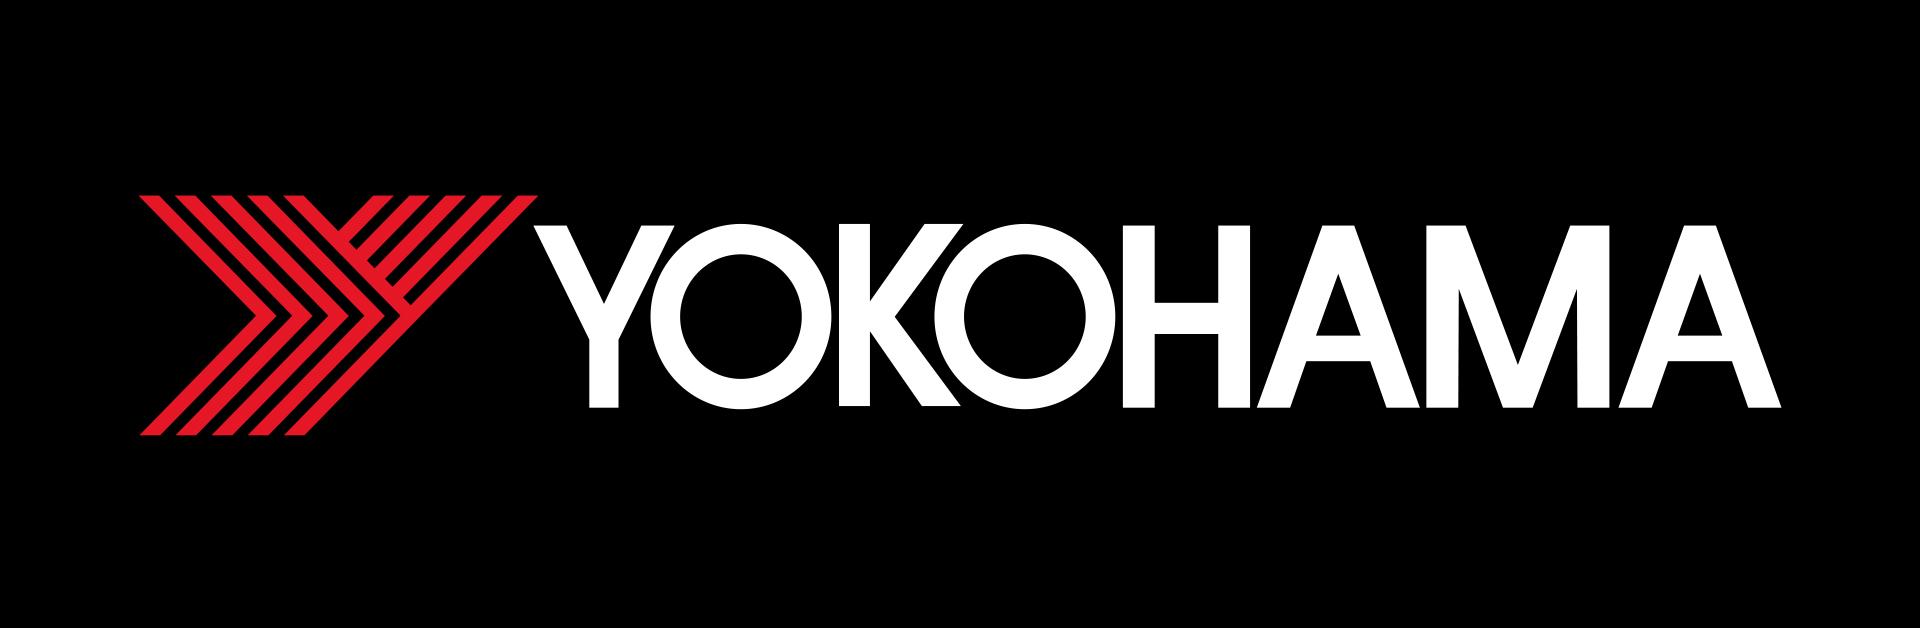 YOKOHAMA DE